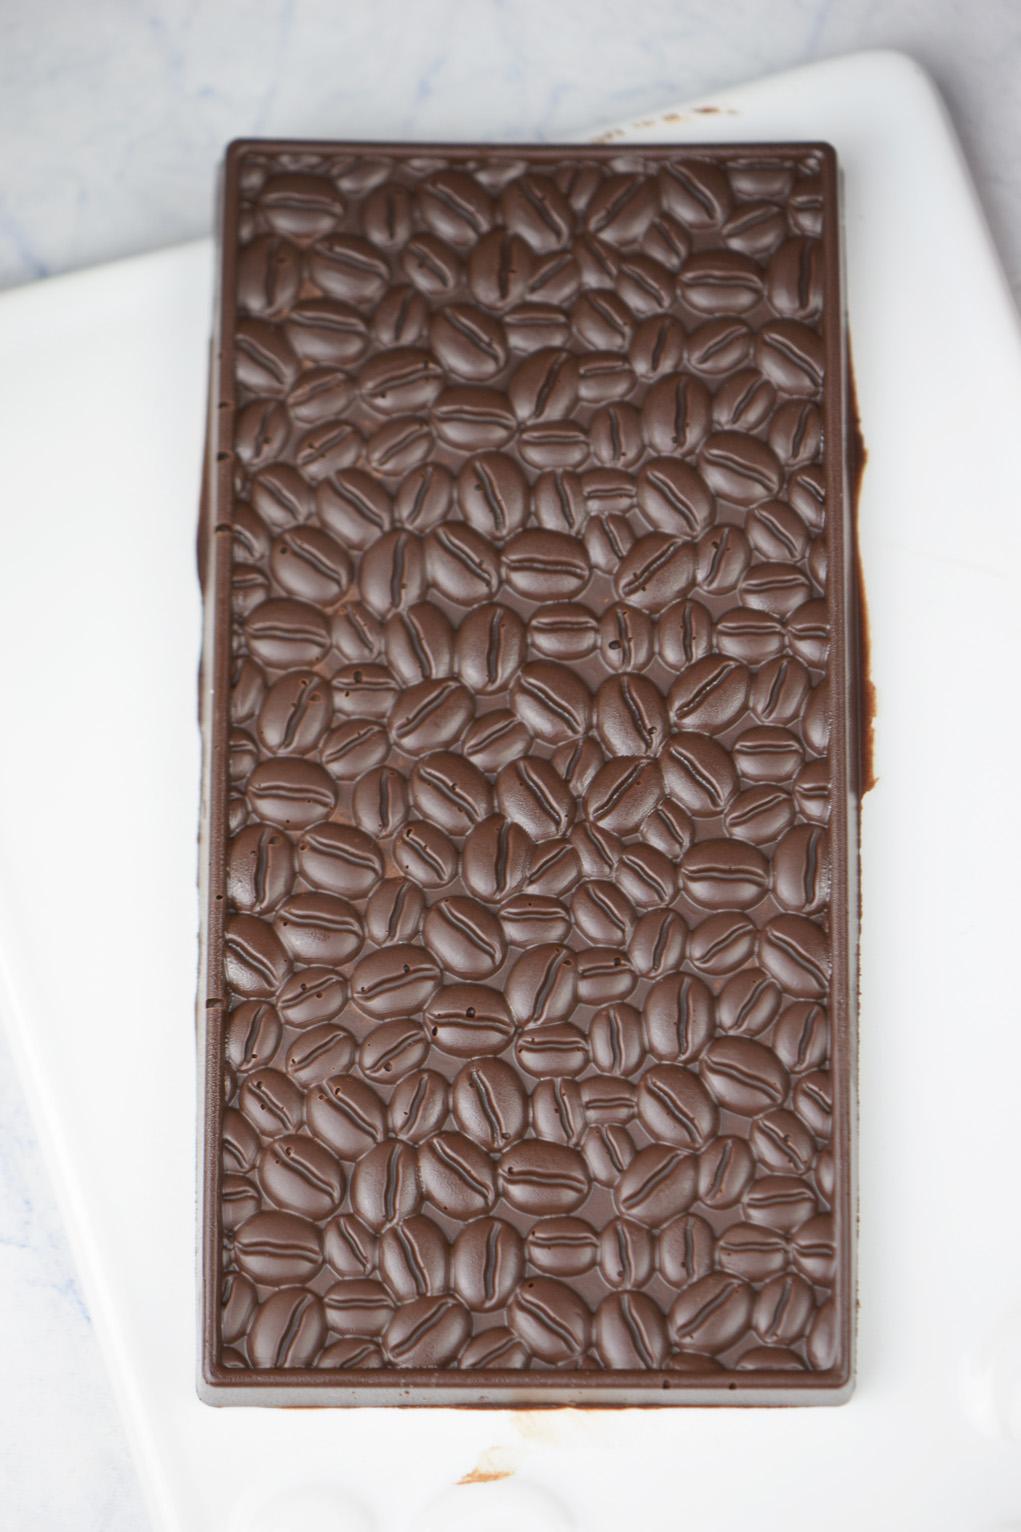 vegan chocolate DSC_0019